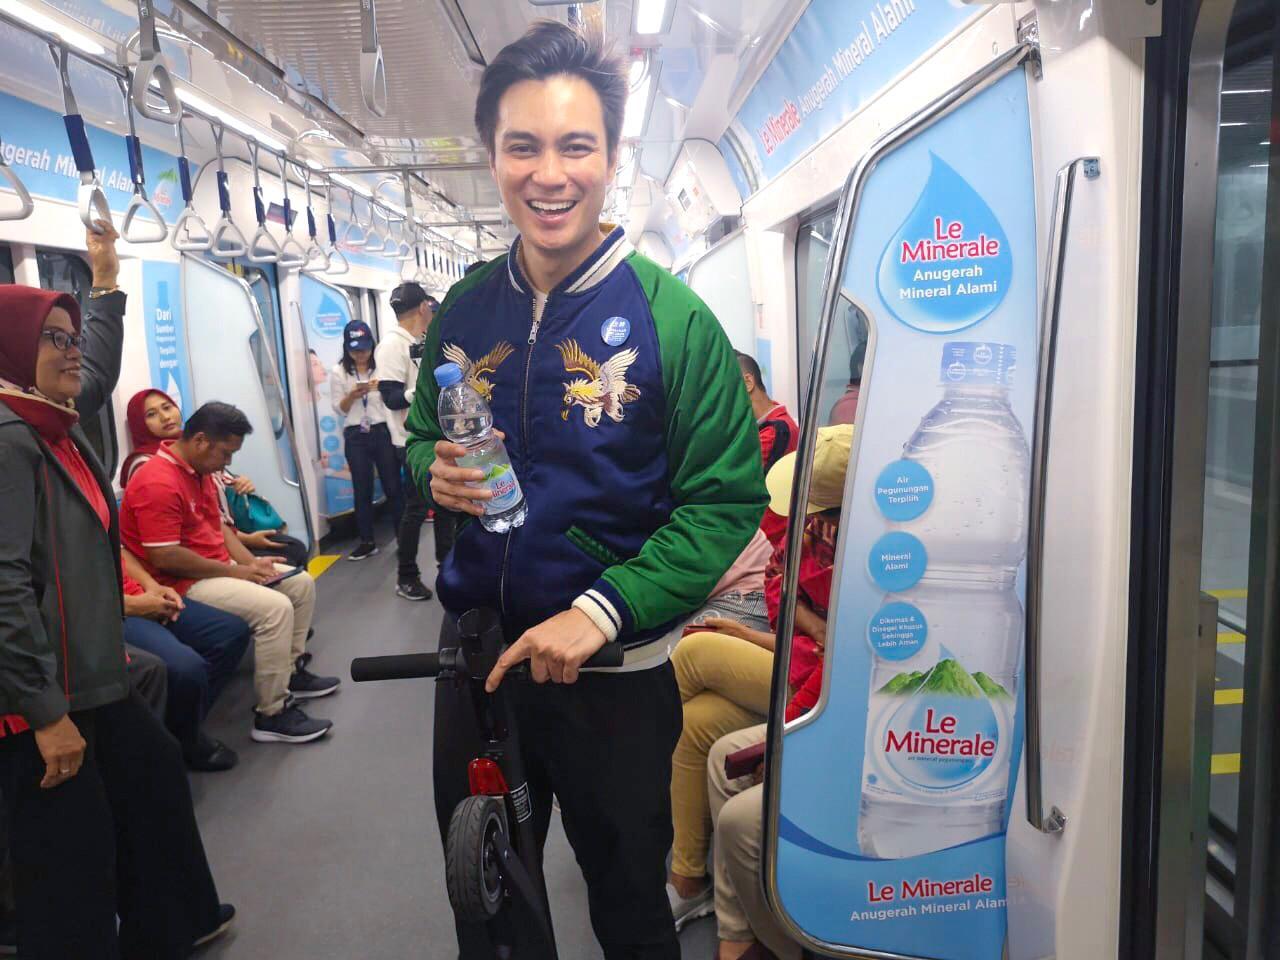 Naik MRT Jakarta, Baim Wong Berasa di Luar Negeri